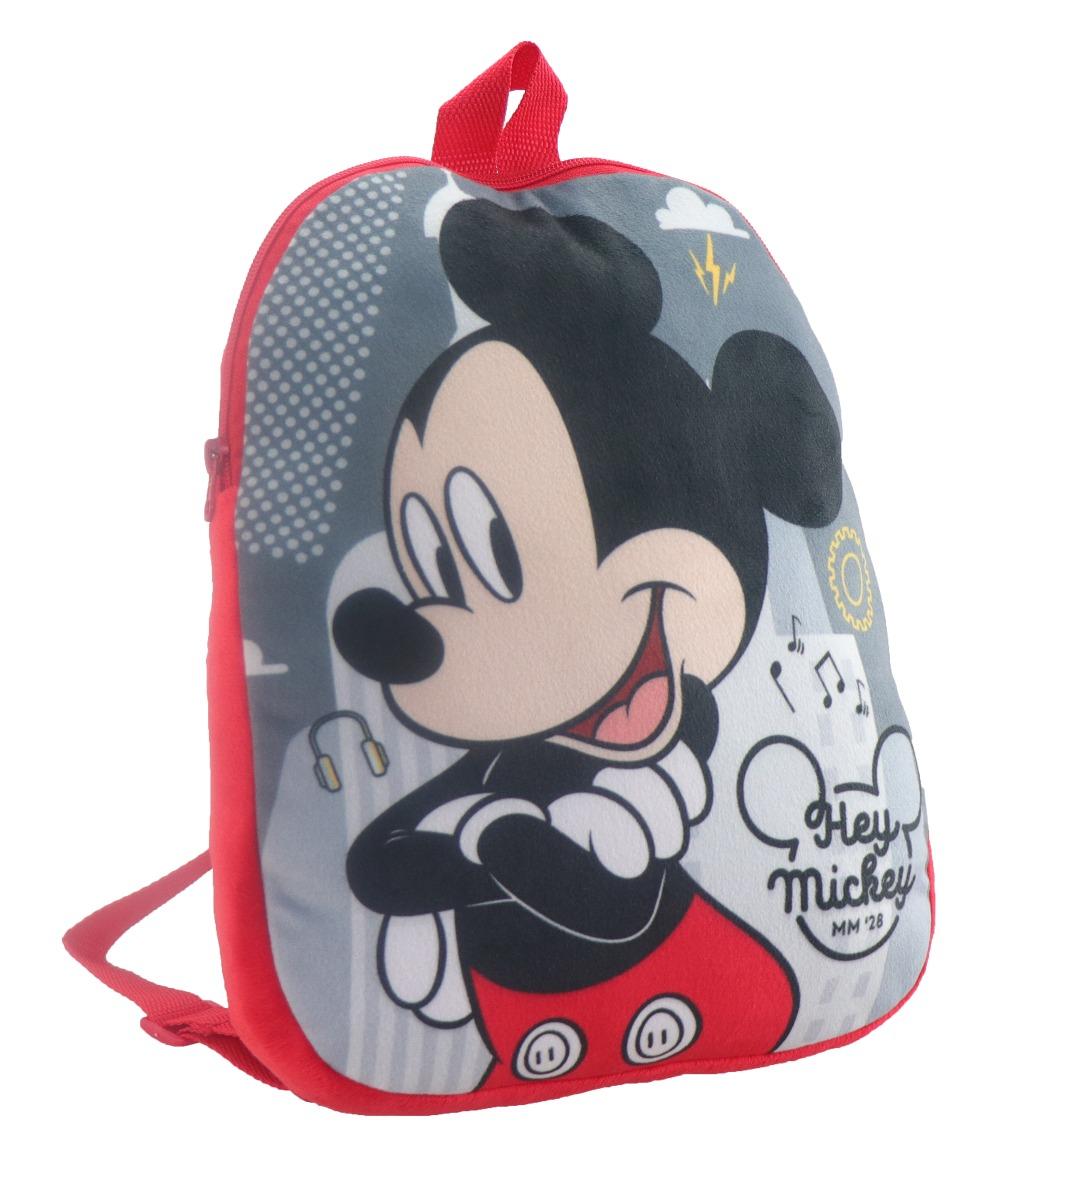 Ghiozdan de plus Disney Mickey Mouse, 26 x 32 cm